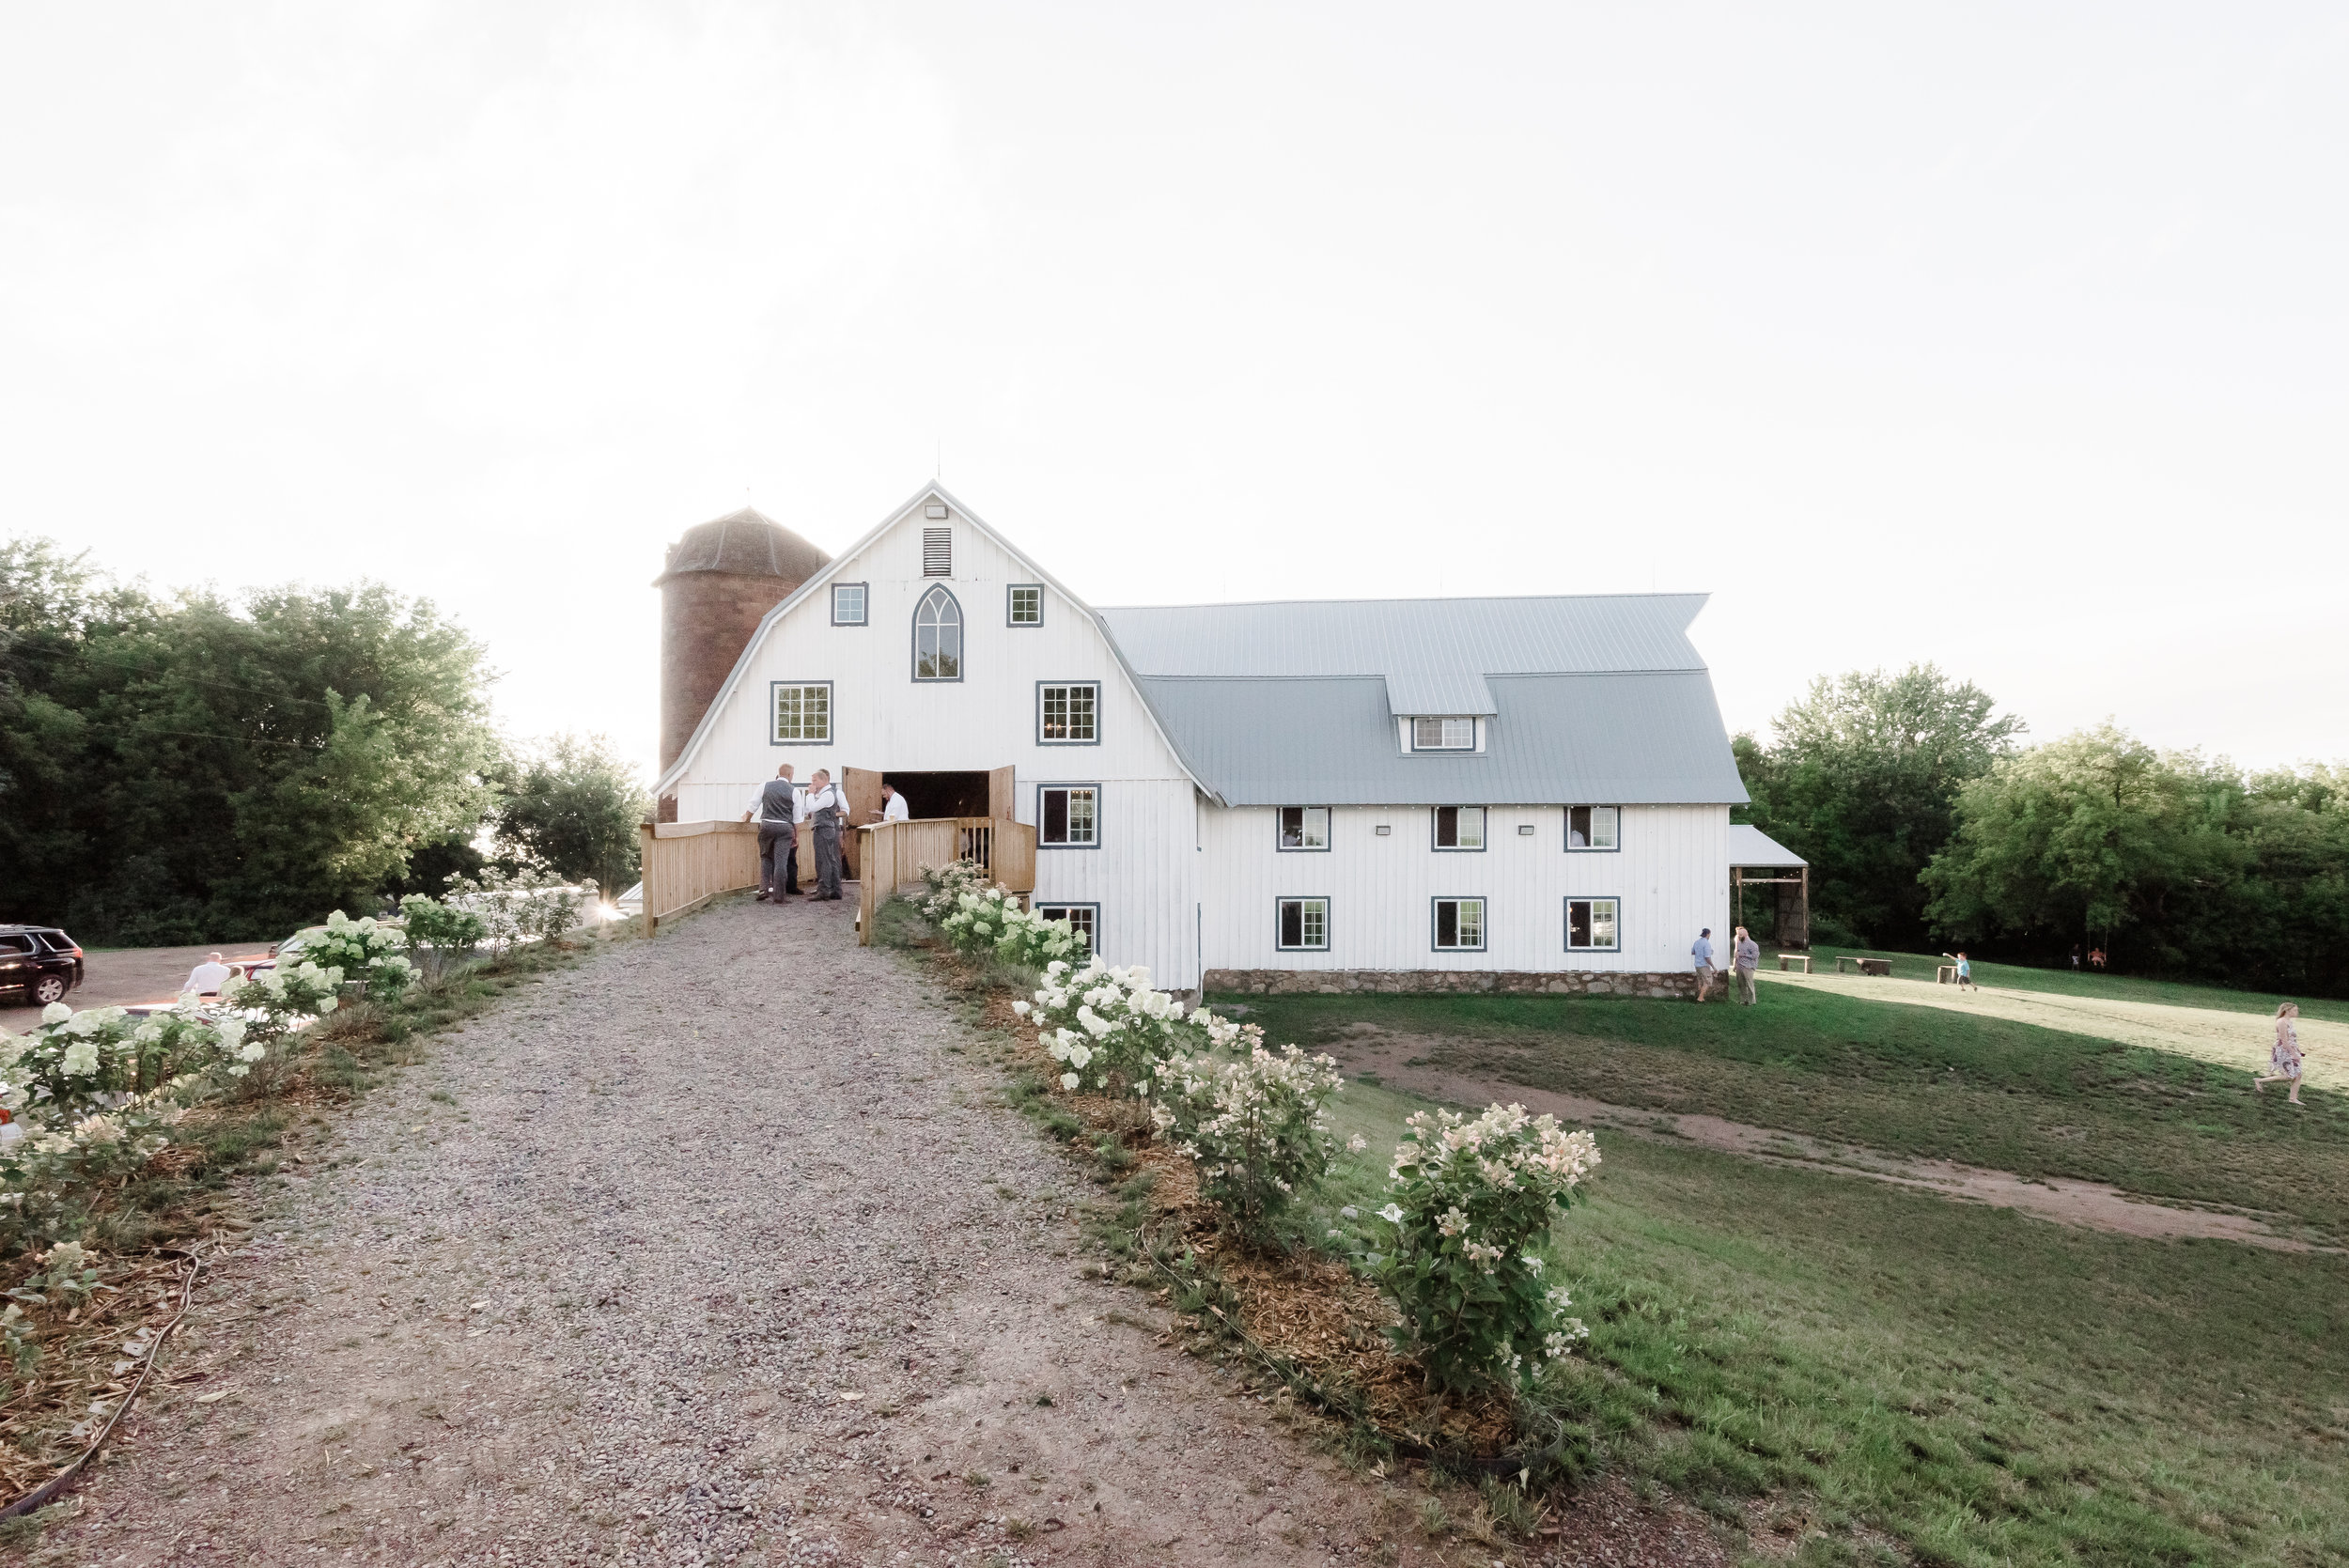 Beautiful Bloom Lake Barn Wedding Venue at Sunset in Shafer, MN